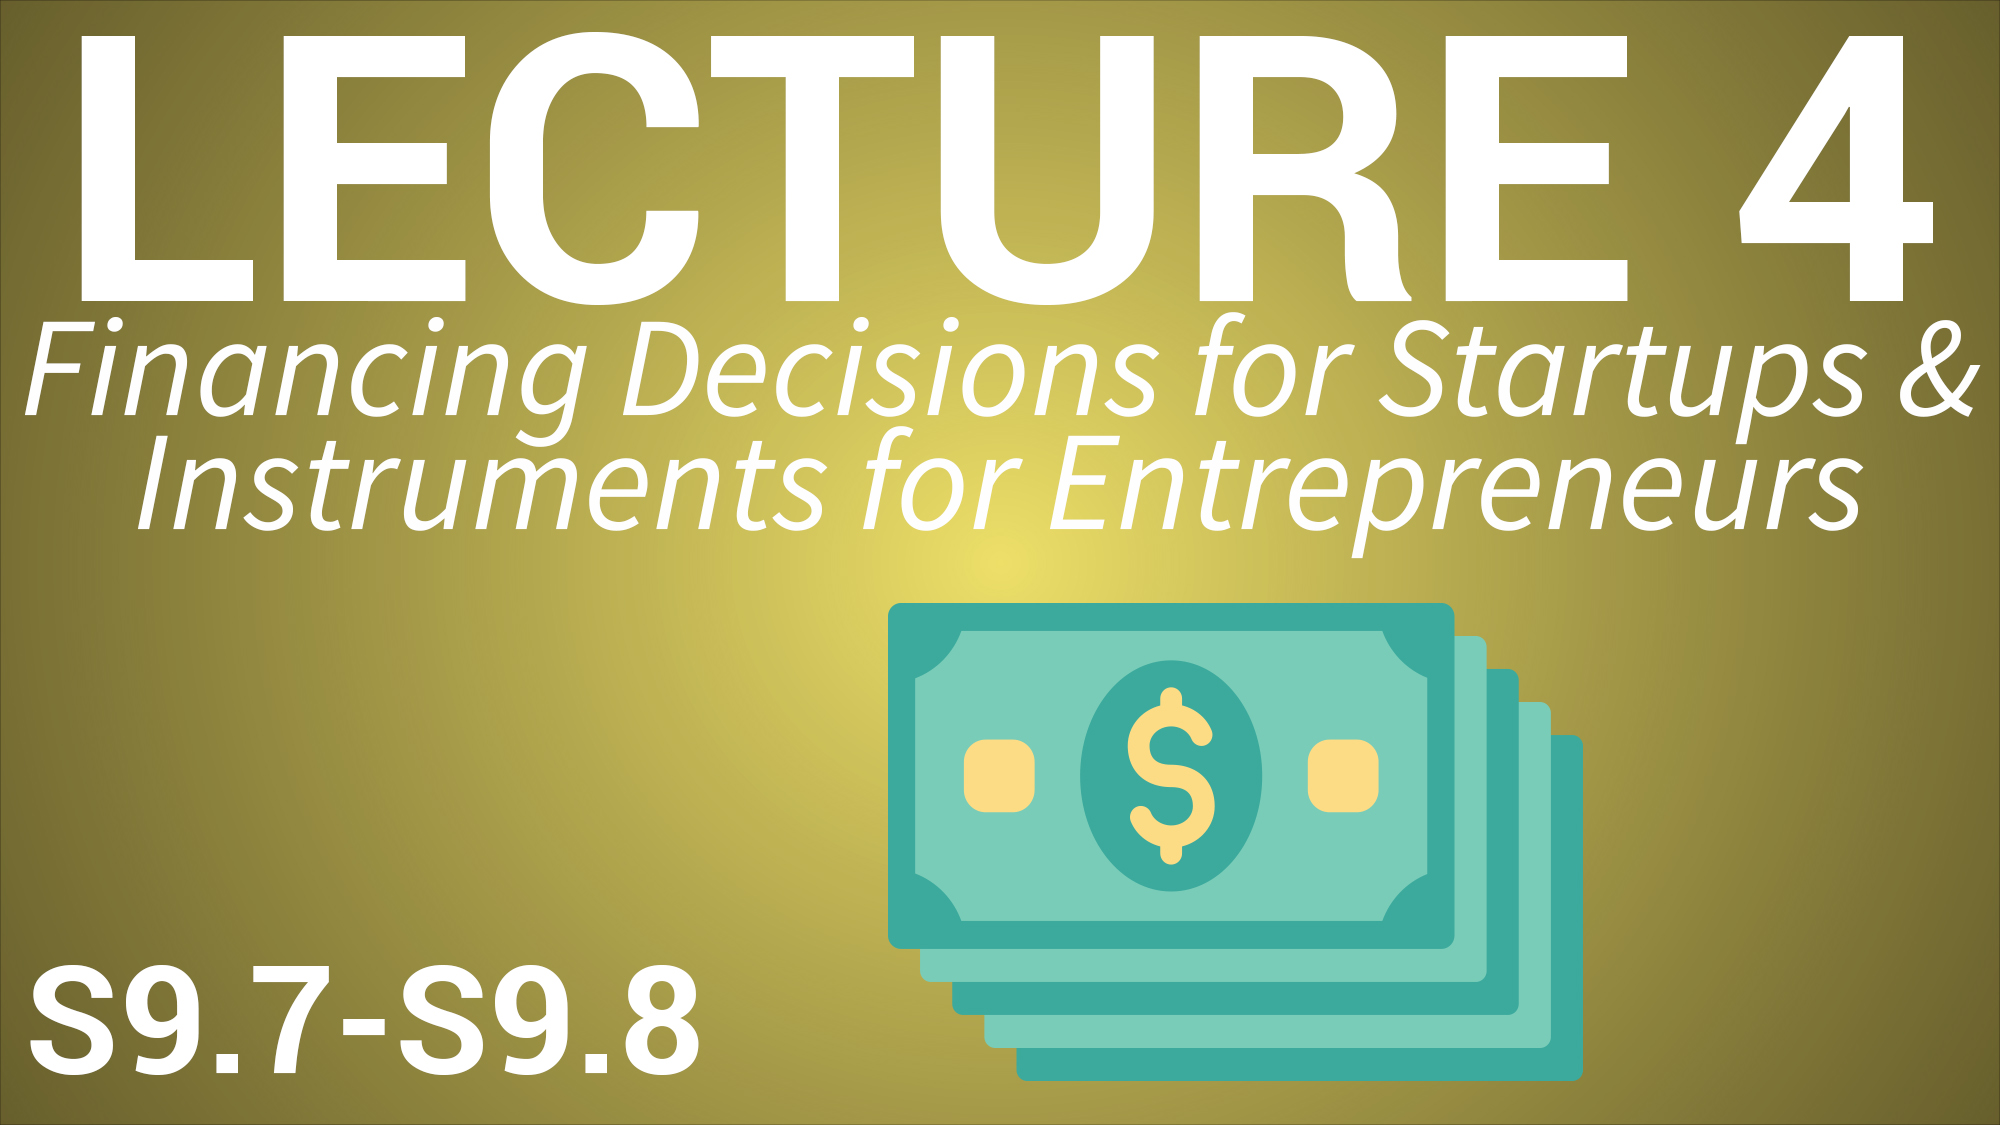 Entrepreneurship & Innovation Management - Lecture 4: Financing Decisions for Startups & Instruments for Entrepreneurs